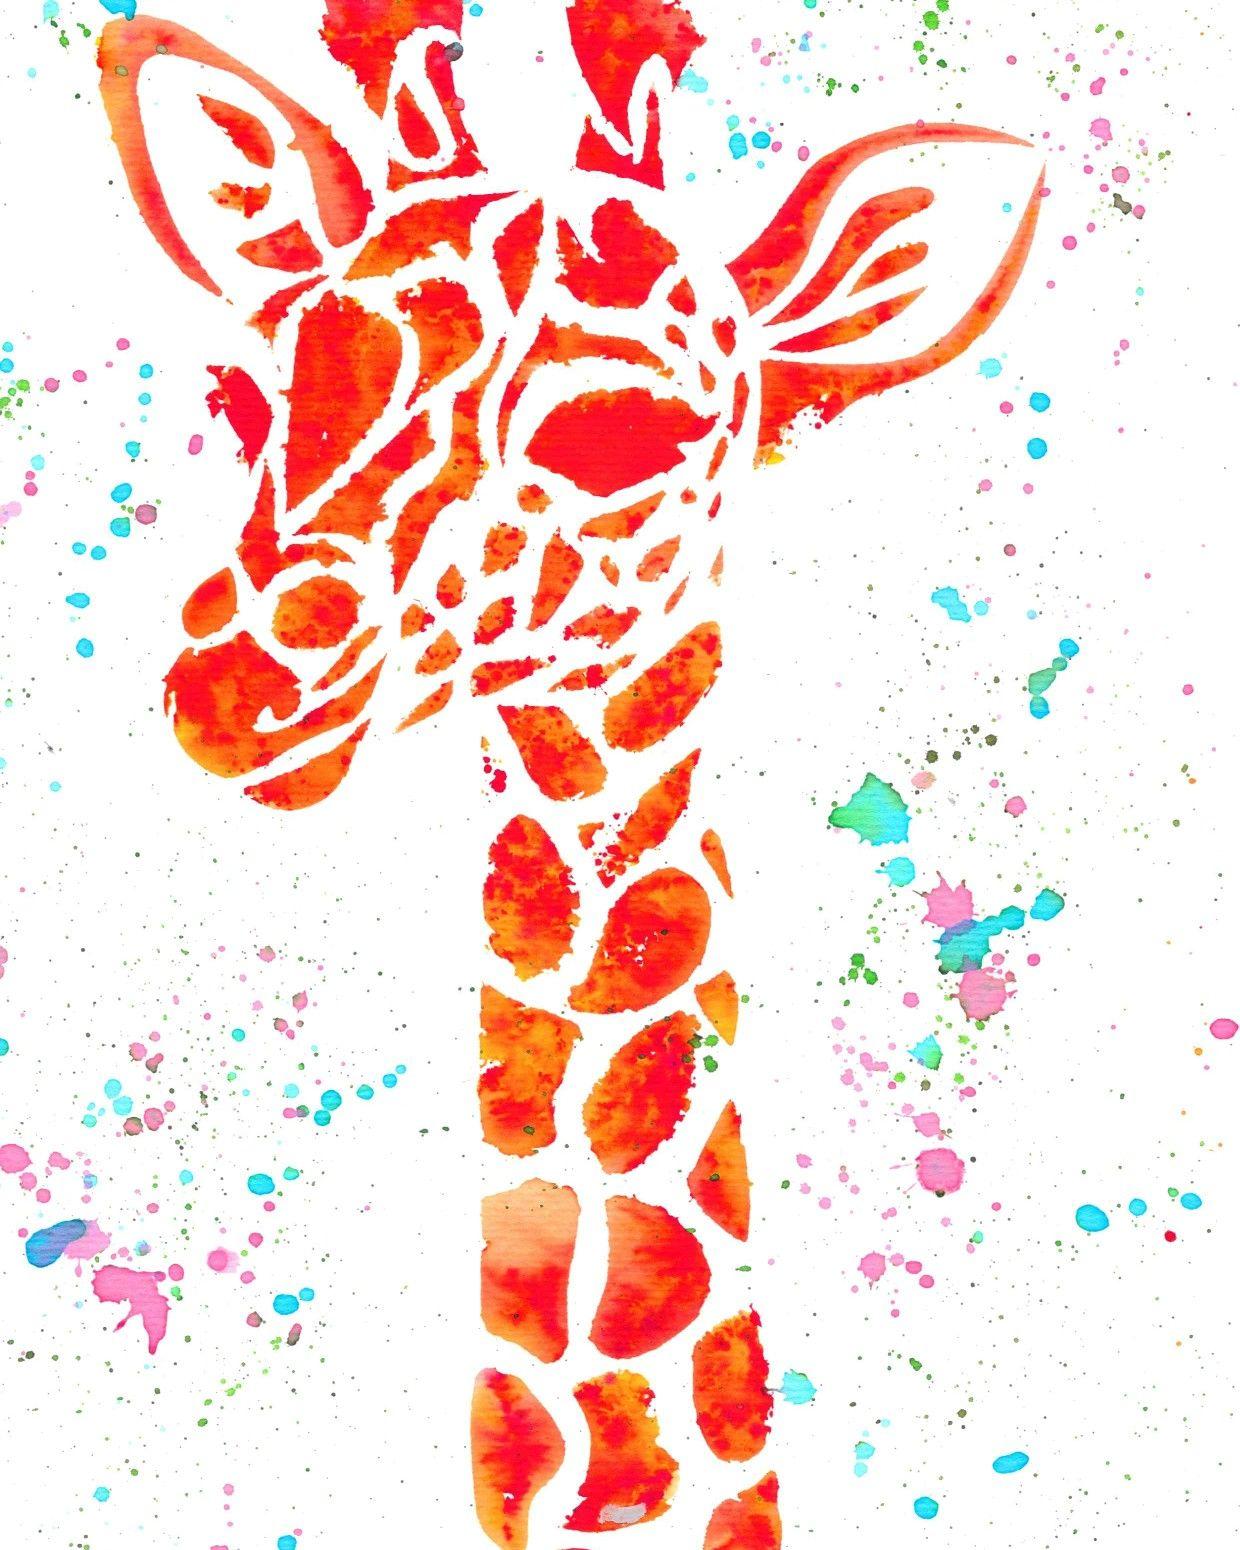 Giraffe with ecoline ink #watercolour #watercolour #watercolor #watercolorpainting #water #art #artist #artistsoninstagram #artwork #artistoninstagram #artoftheday #art #ecoline #aquarellepainting #aquarelle #draweveryday #drawingoftheday #drawdrawdraw #drawingsketch #drawings #drawing #drawingdaily #drawingsofinstagram #drawingchallenge